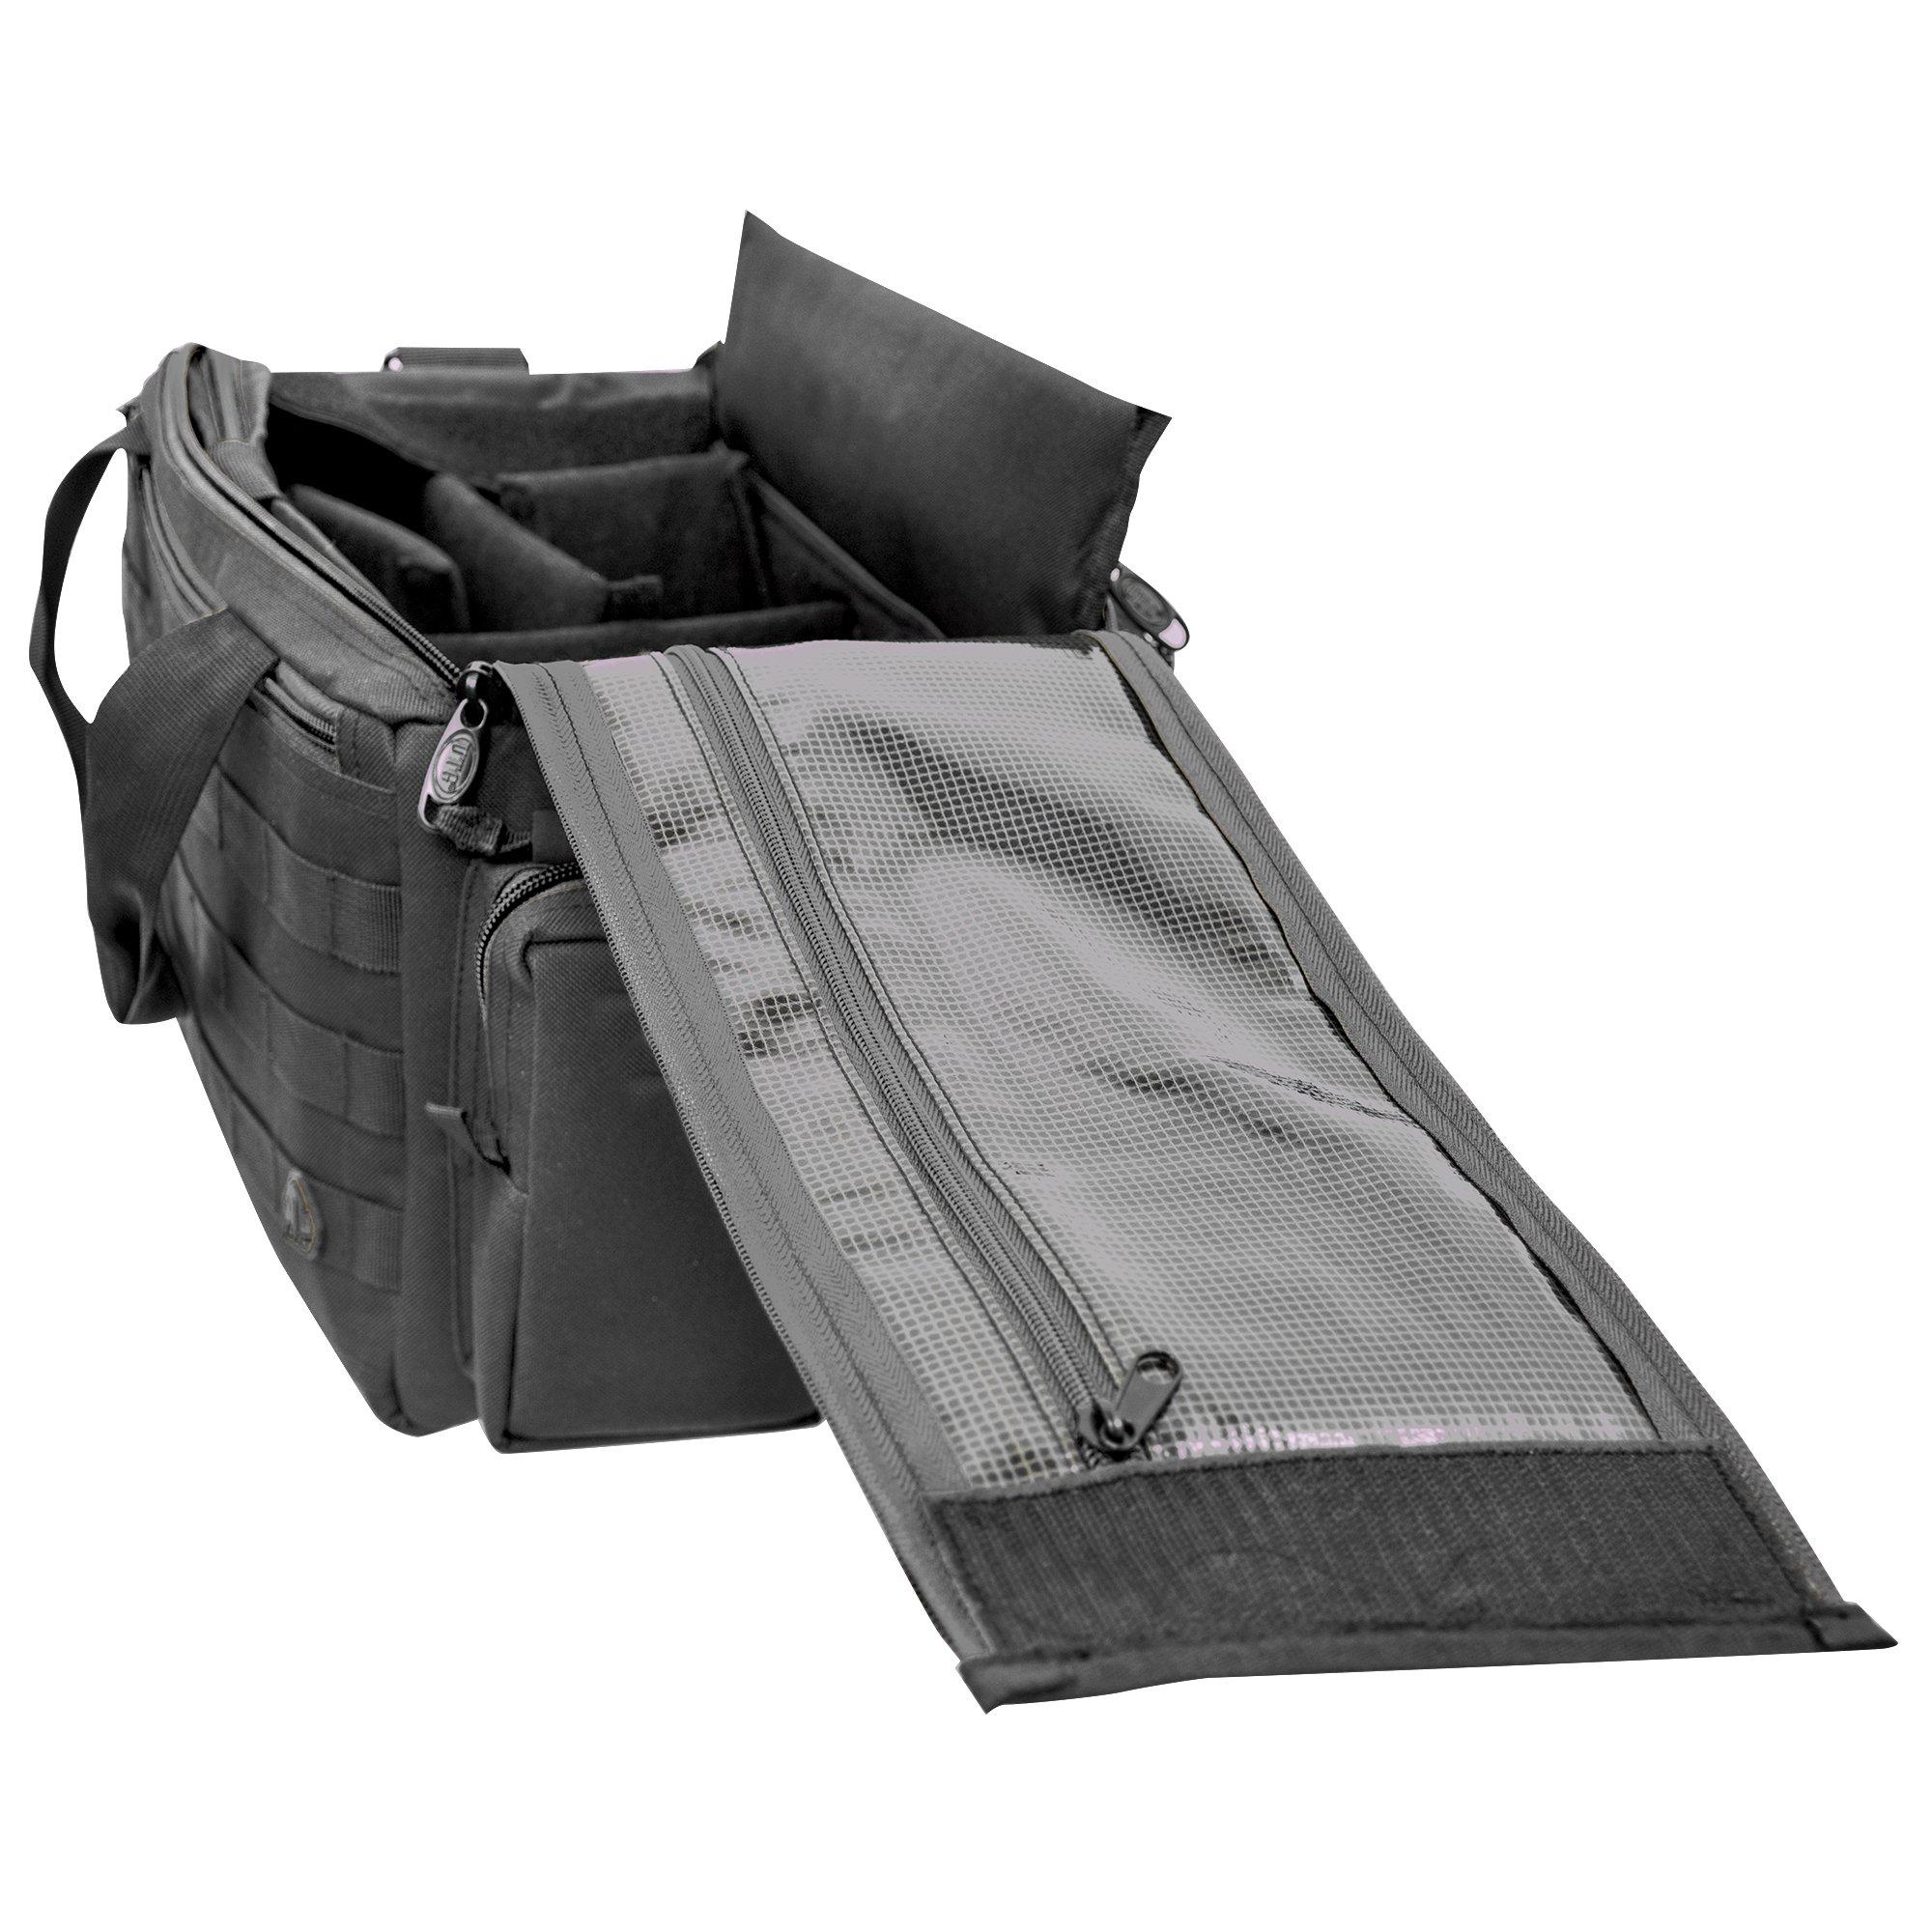 UTG All in One Range/Utility Go Bag, Black, 21'' x 10'' x 9'' by UTG (Image #4)